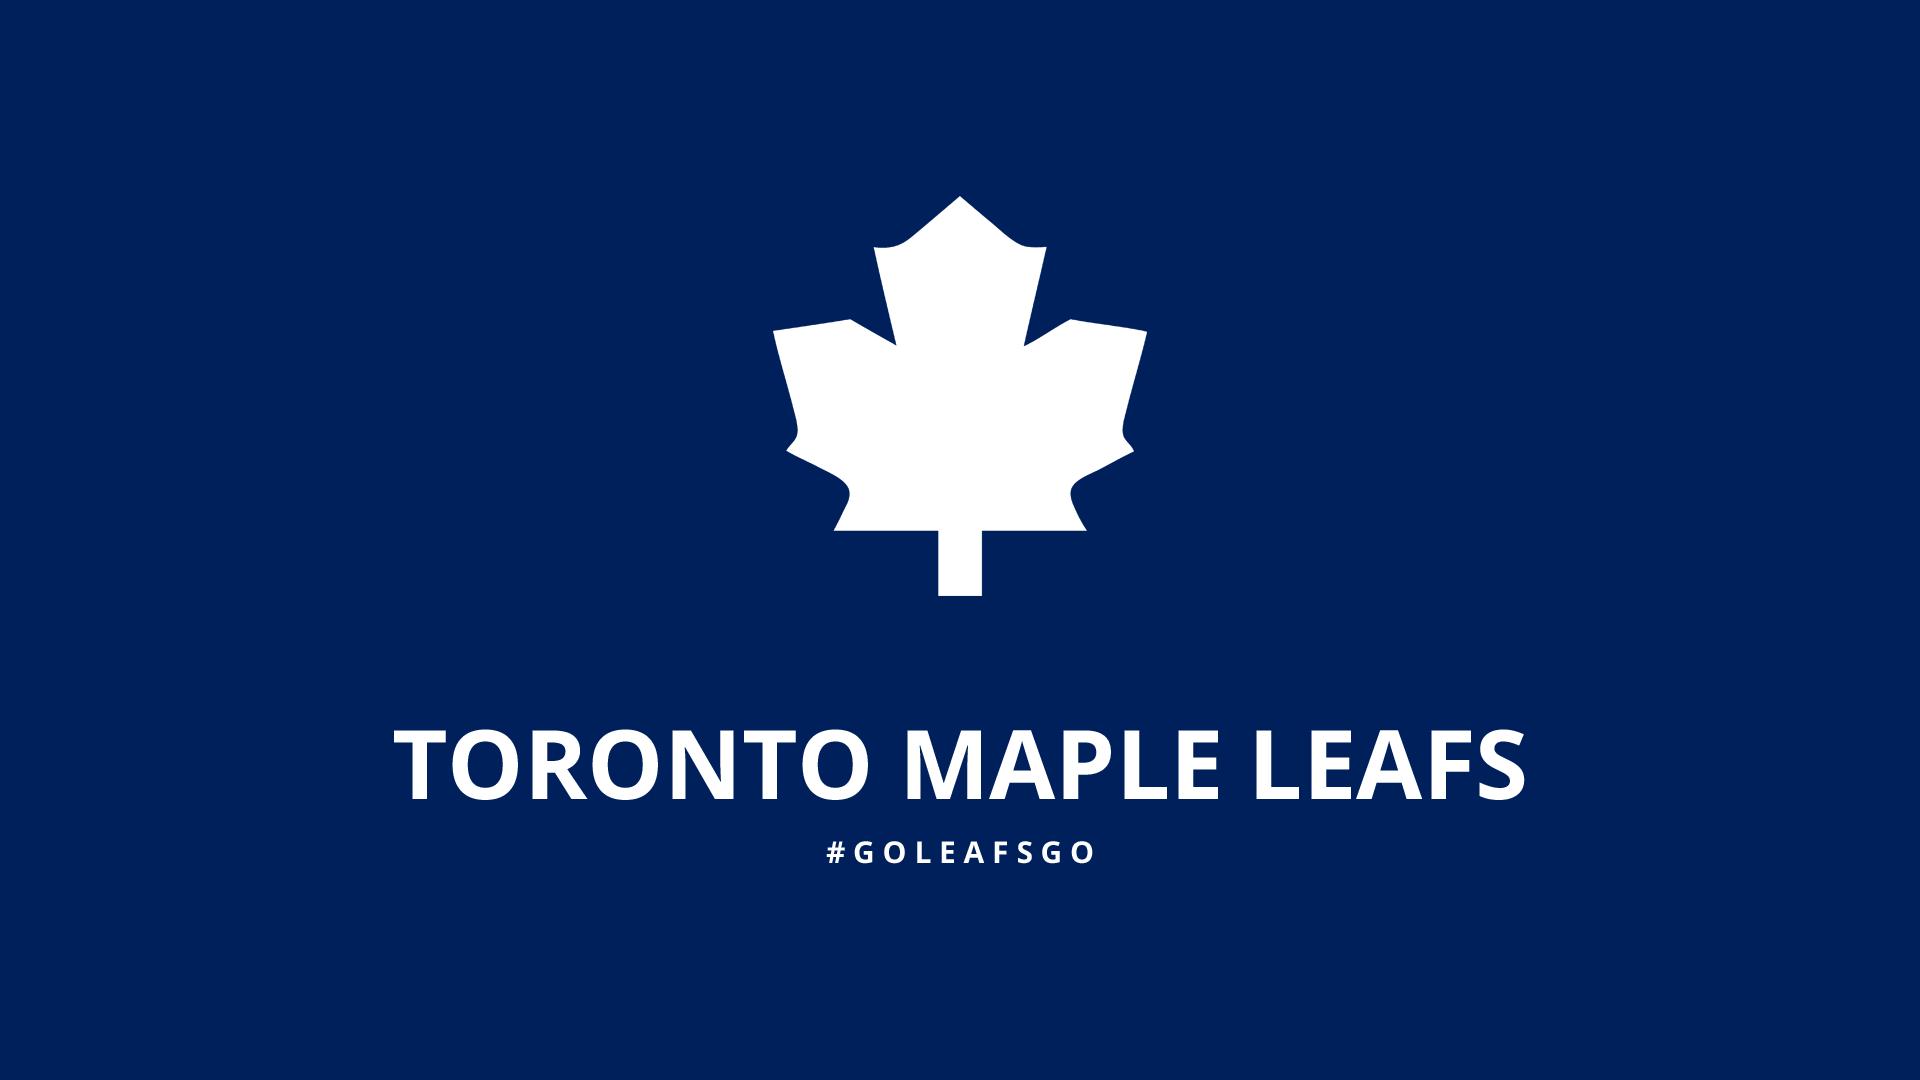 Minimalist Toronto Maple Leafs wallpaper by lfiore 1920x1080